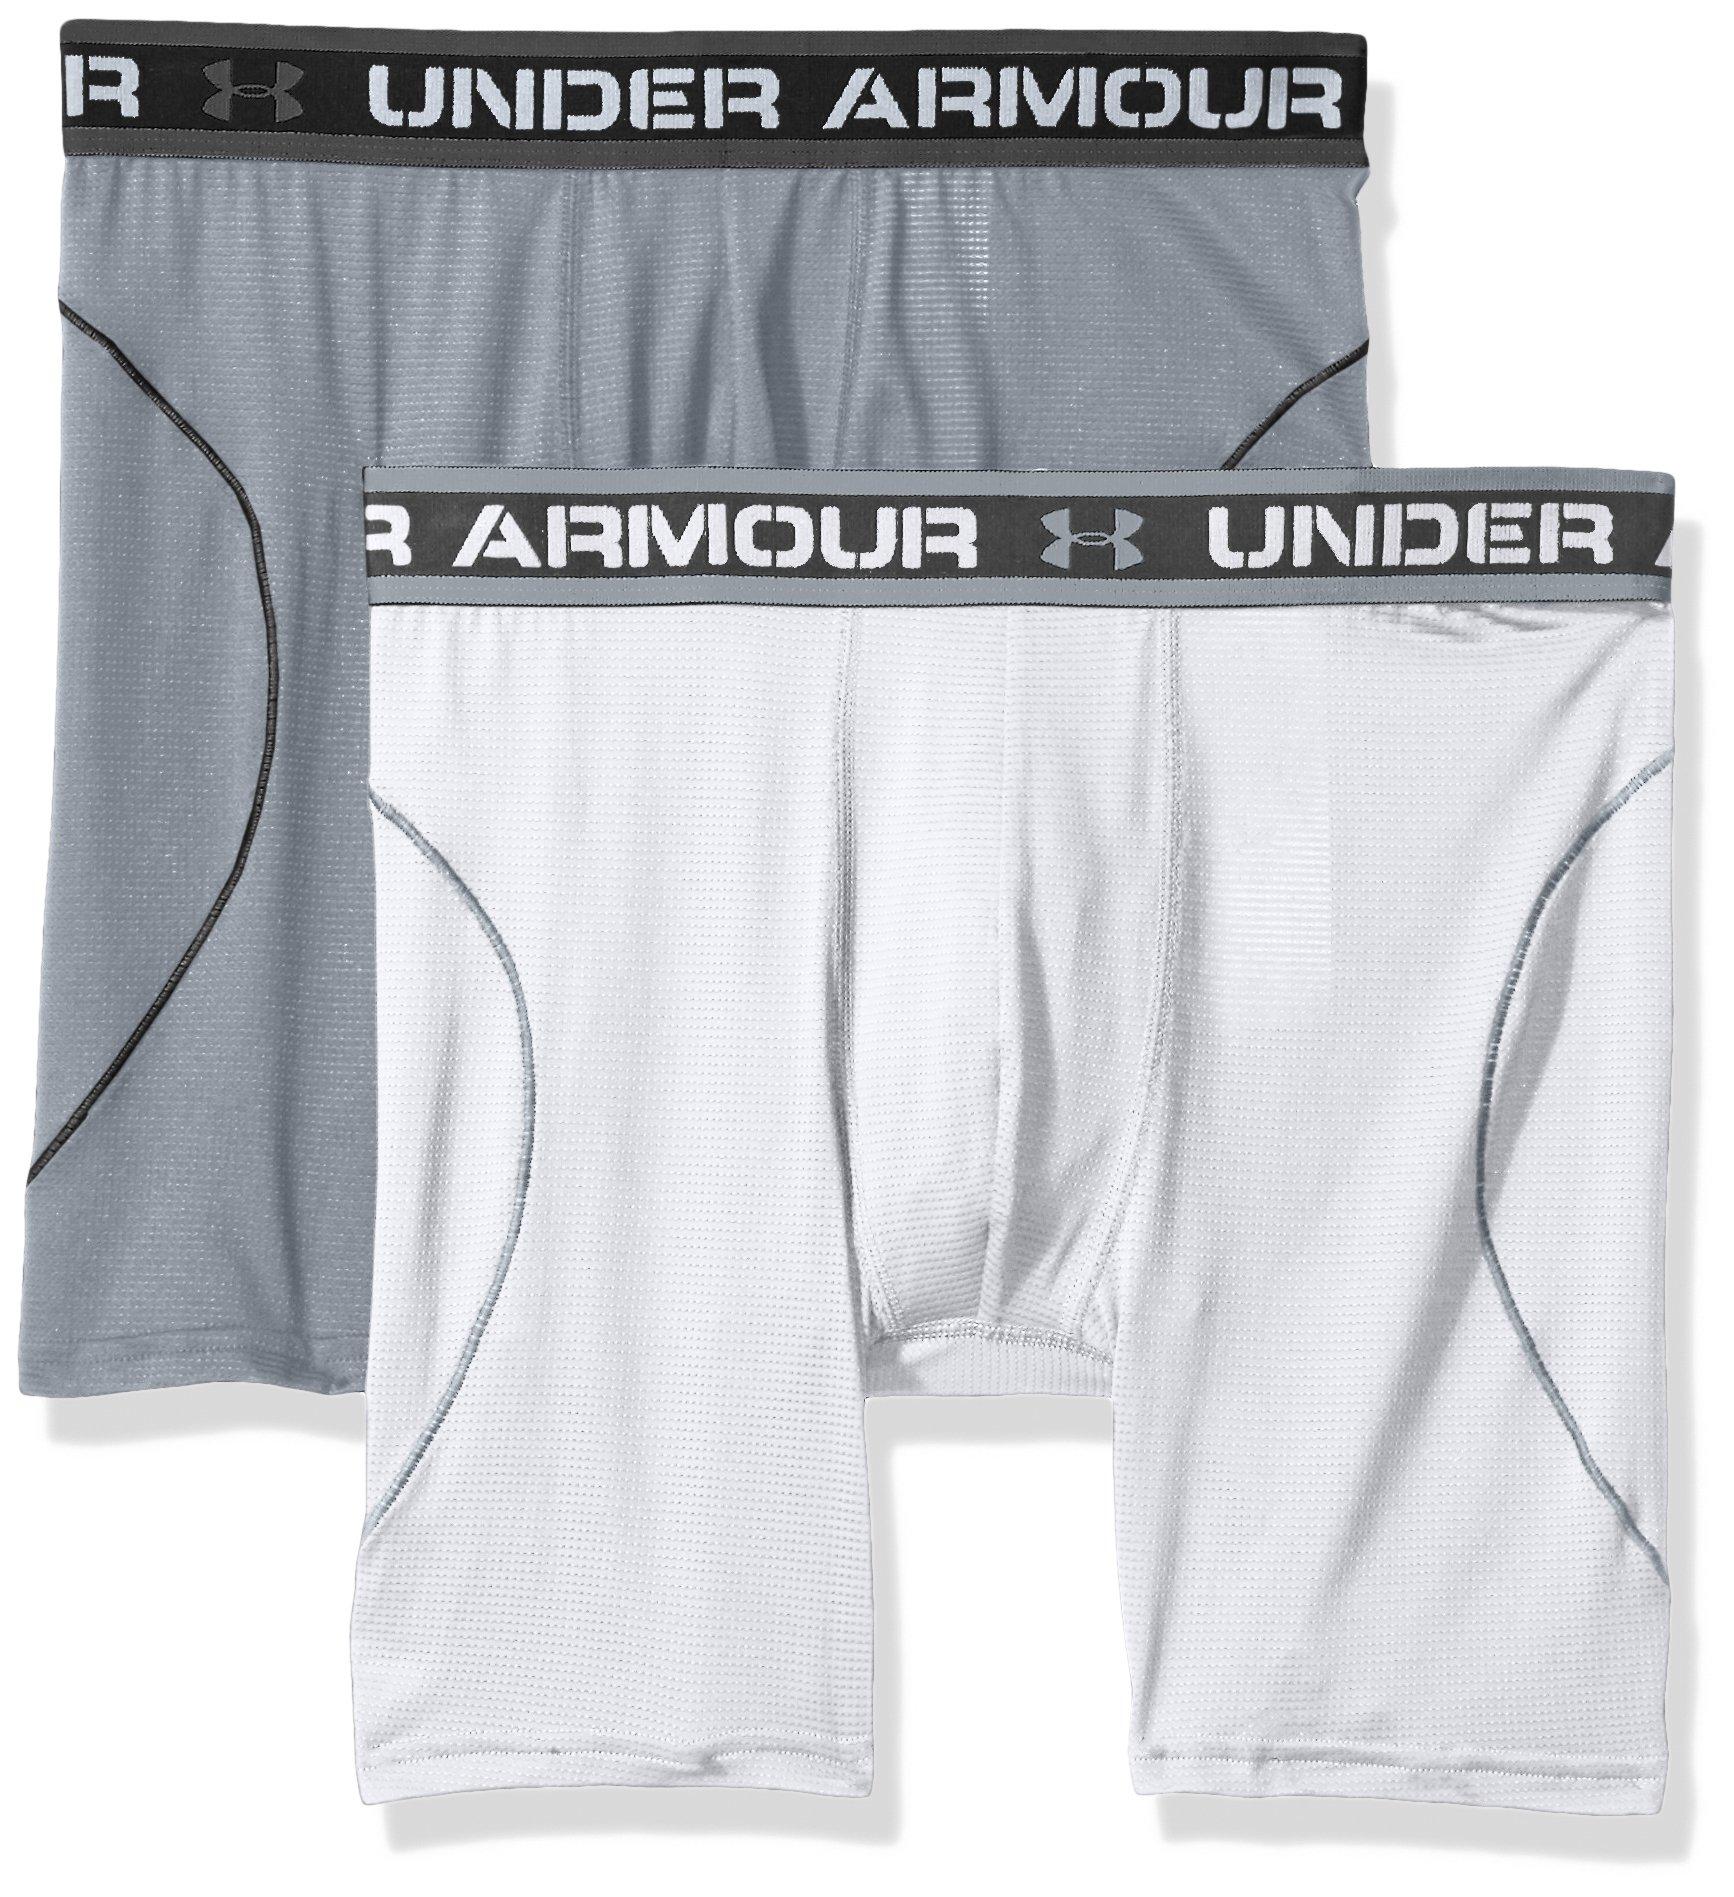 Under Armour Men's Iso-Chill Mesh 6'' Boxerjock – 2-Pack, White (100)/Steel, Large